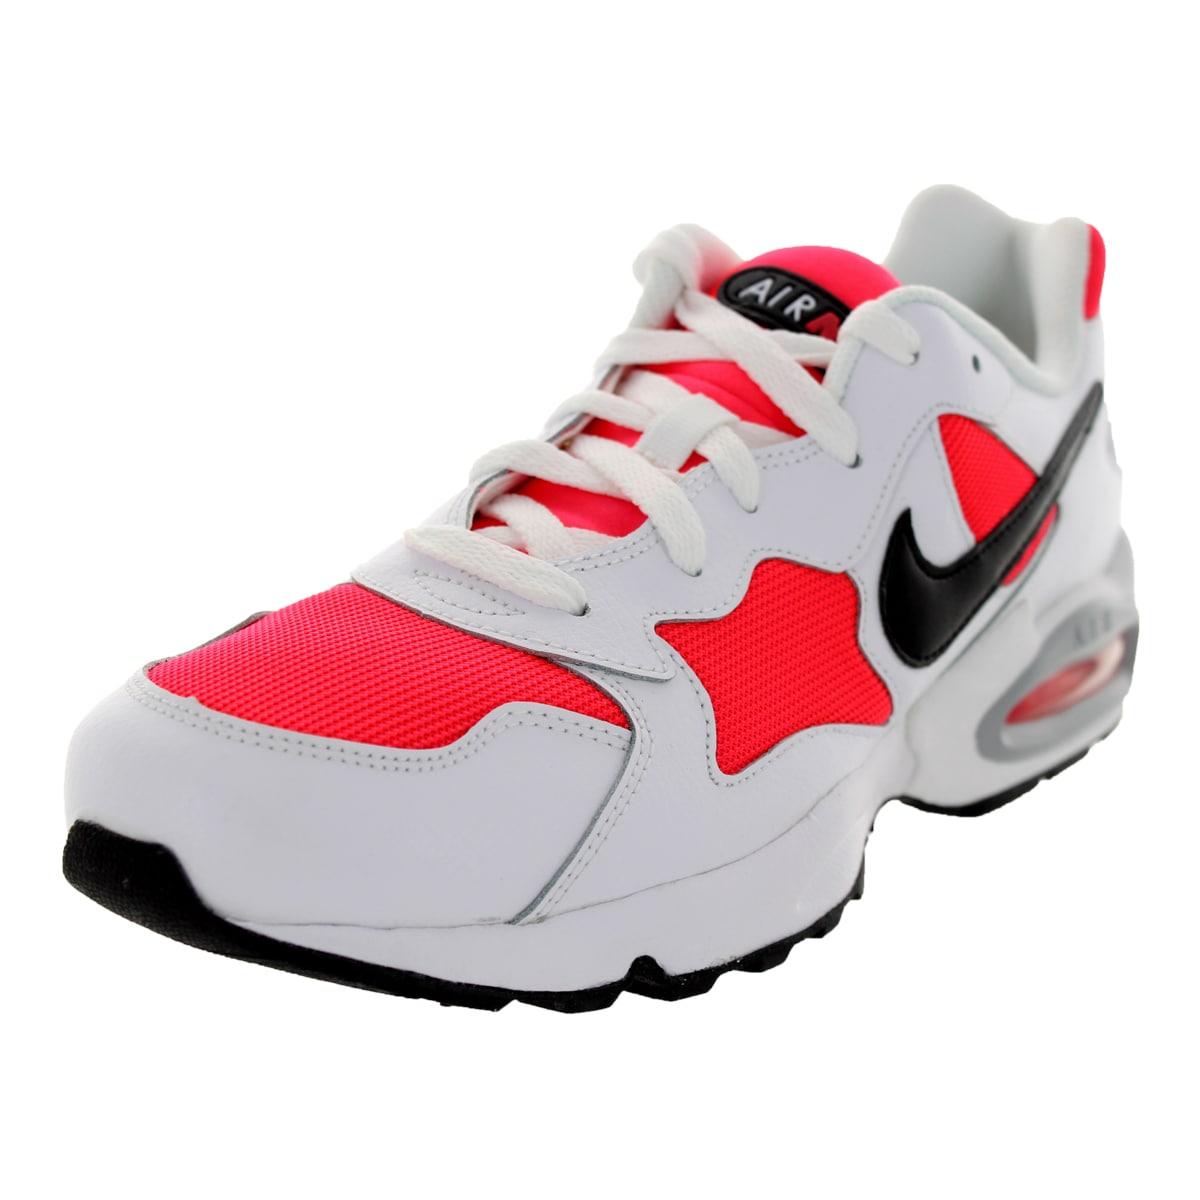 1d43827cd9e Shop Nike Men s Air Max Triax  94 Crimson Black White Running Shoe - Free  Shipping Today - Overstock.com - 12115638